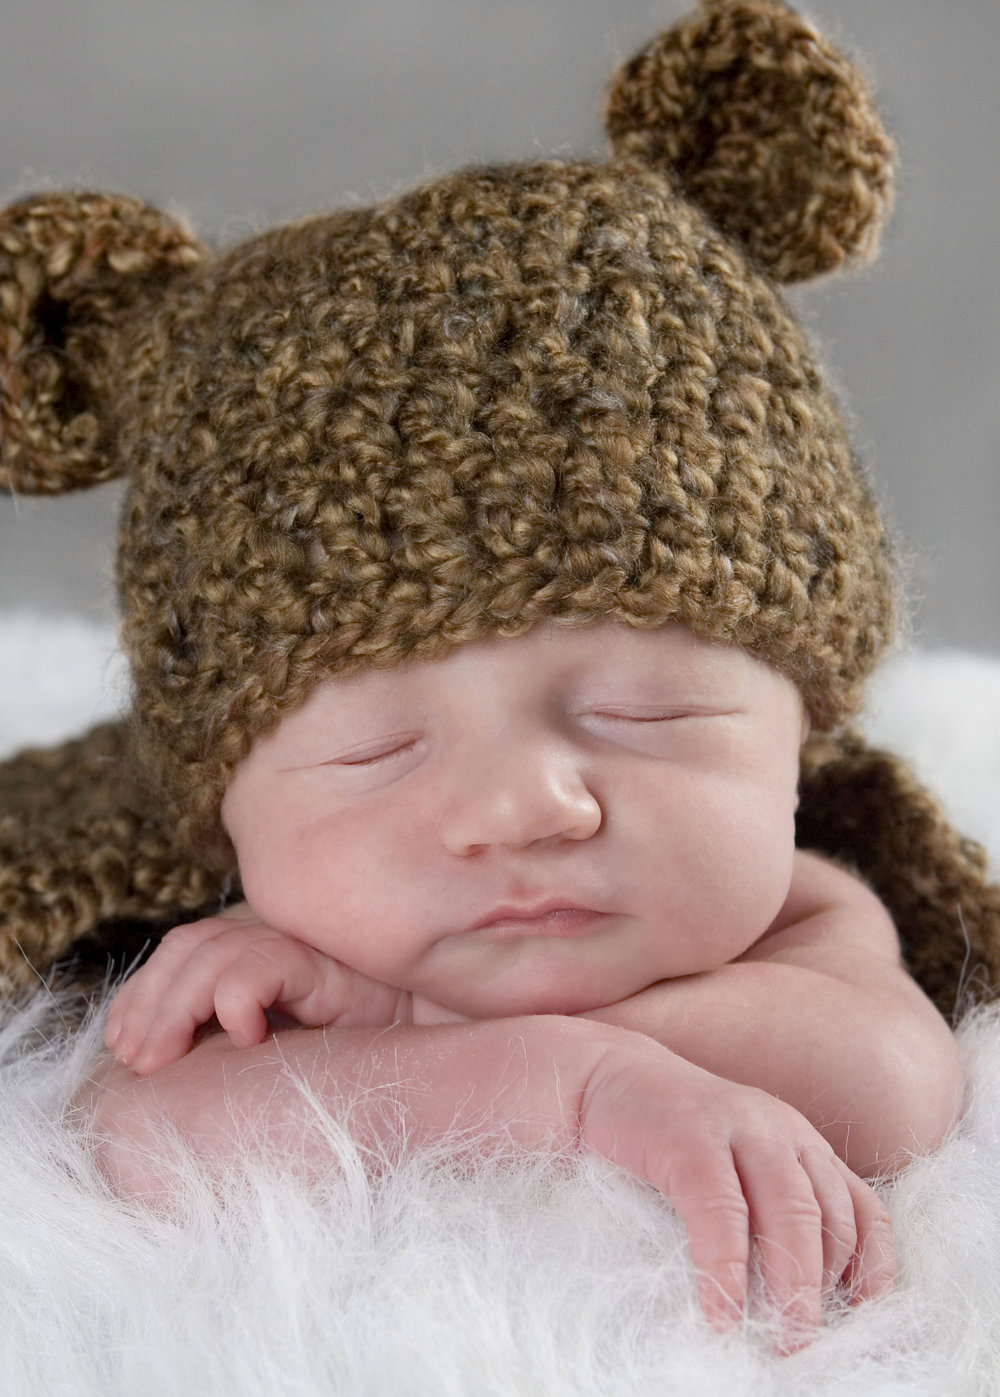 newbornphotographylansingmichiganokemosmichiganinfantbabyboyhatteddybearadorablecuteportrait.jpg